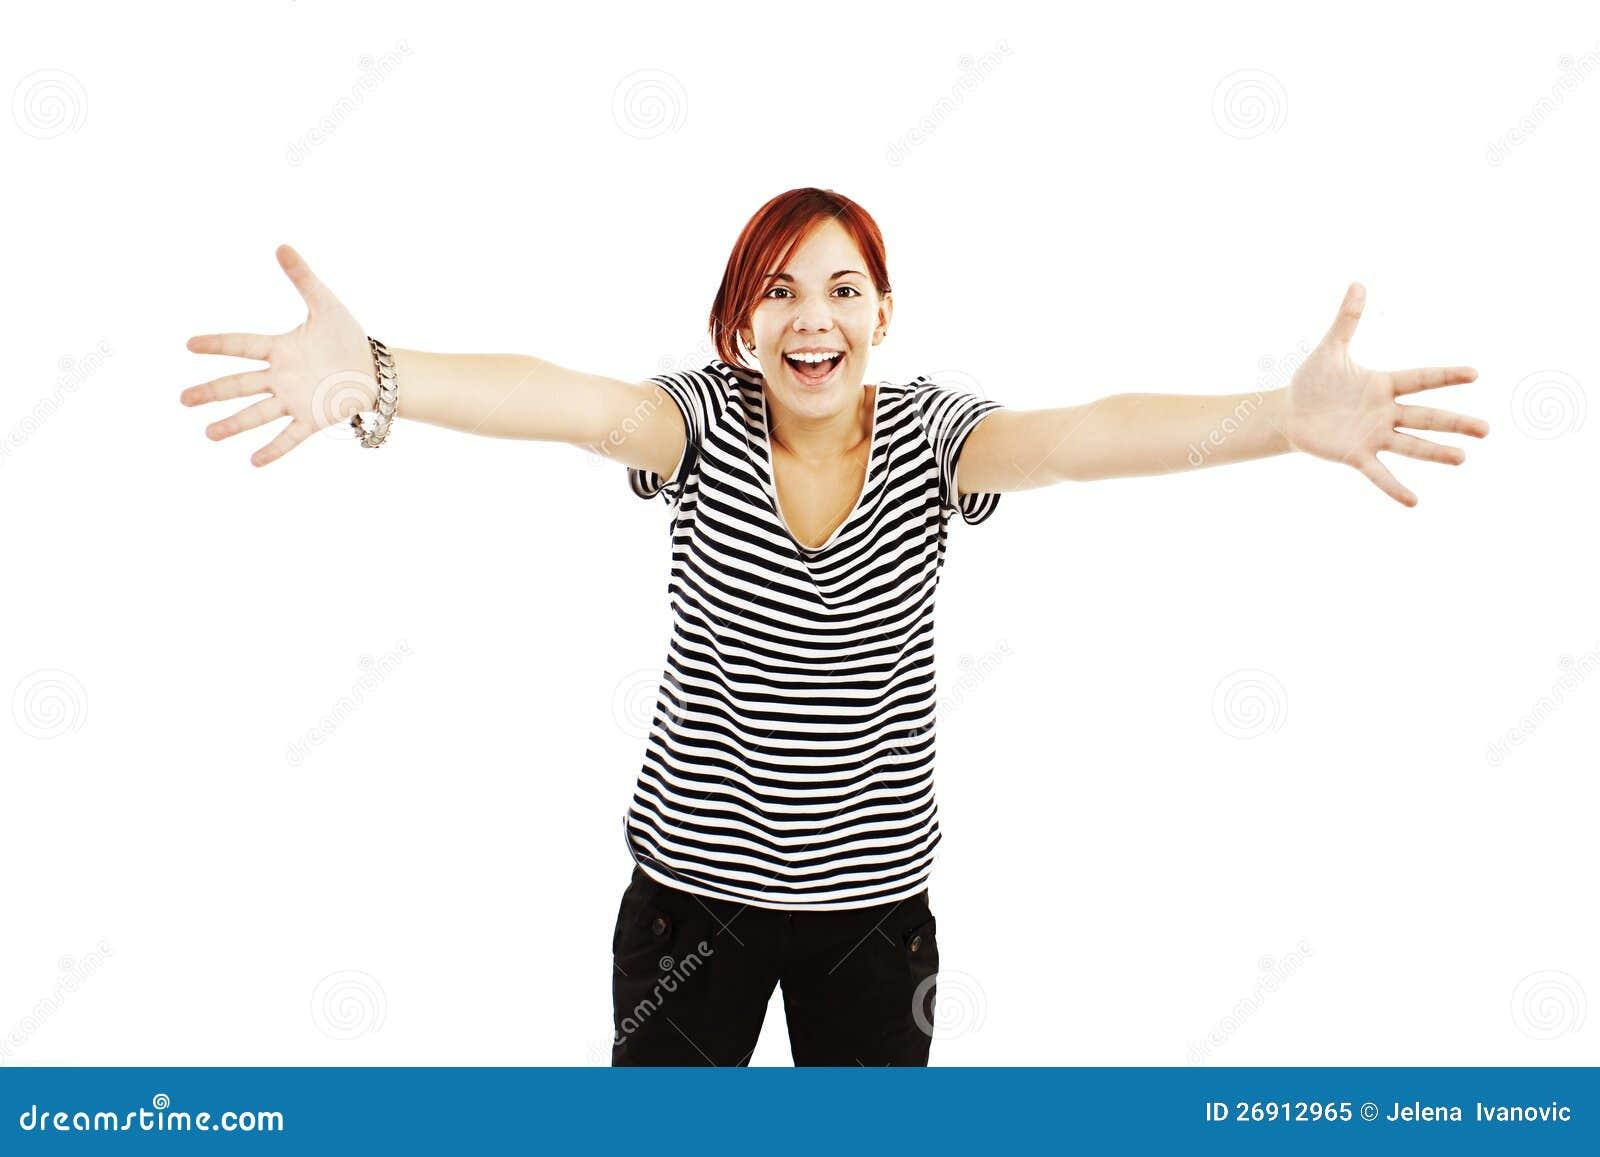 girl arms up Teen